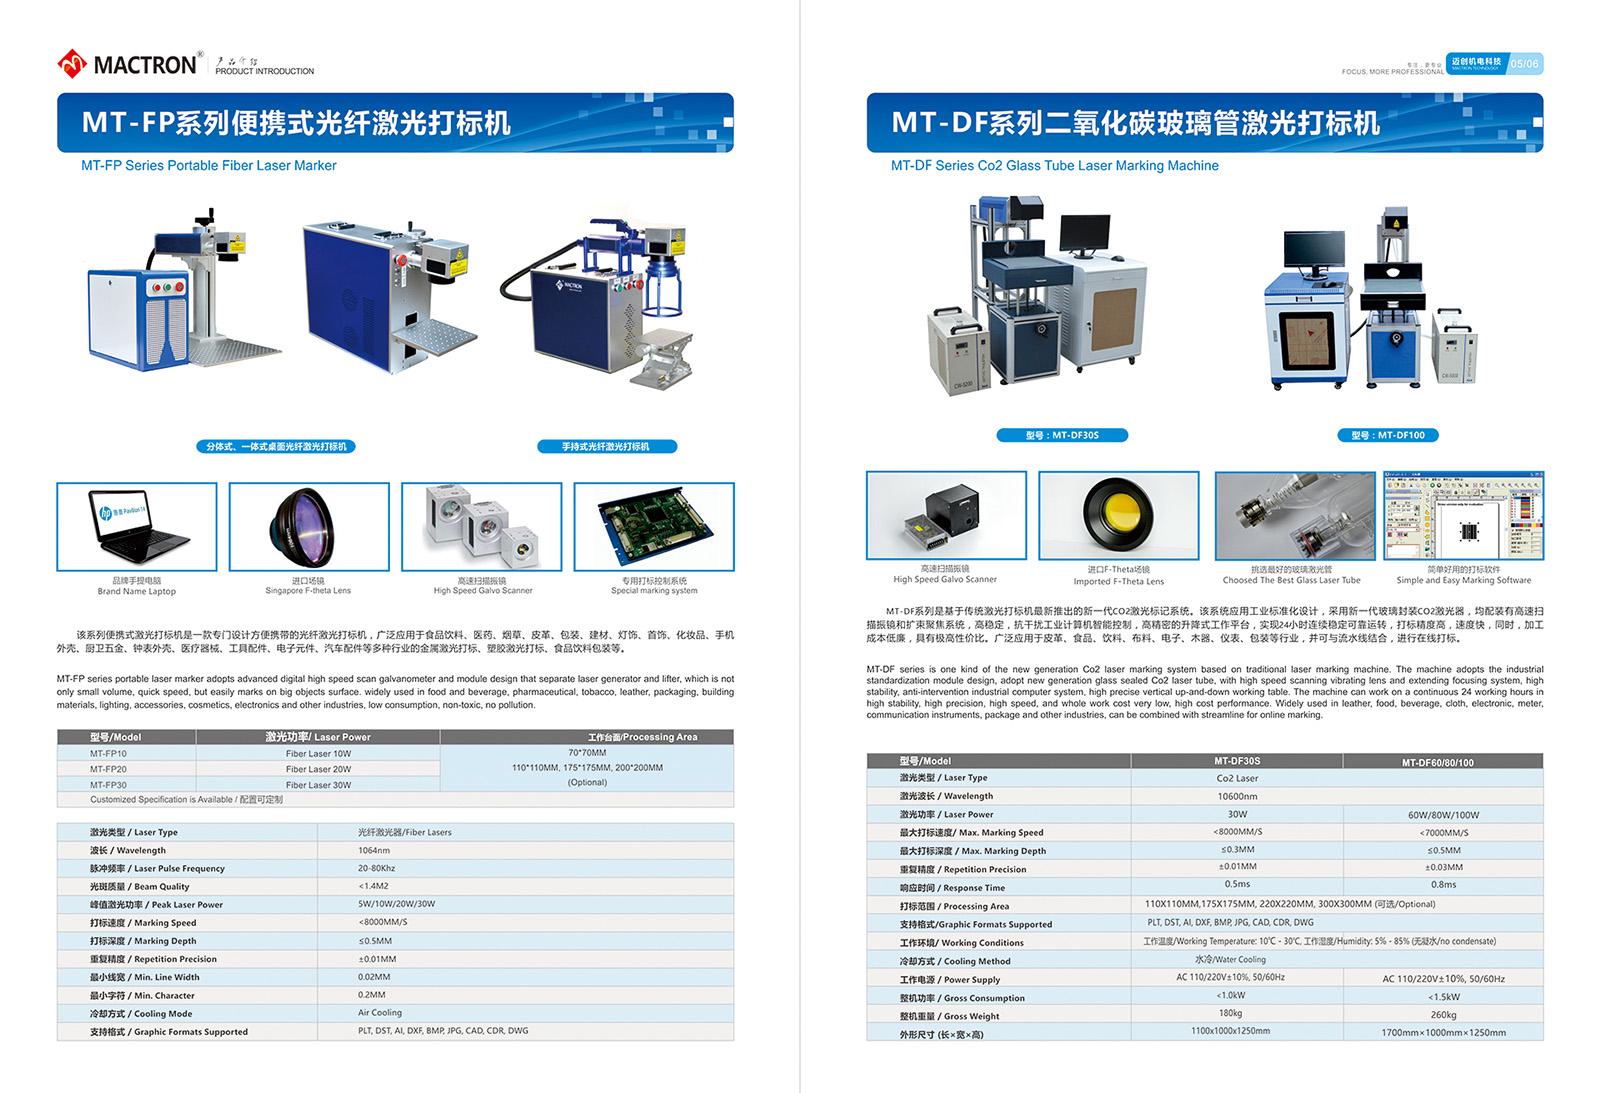 Mactron Tech Laser Catalogue 2017 (4)